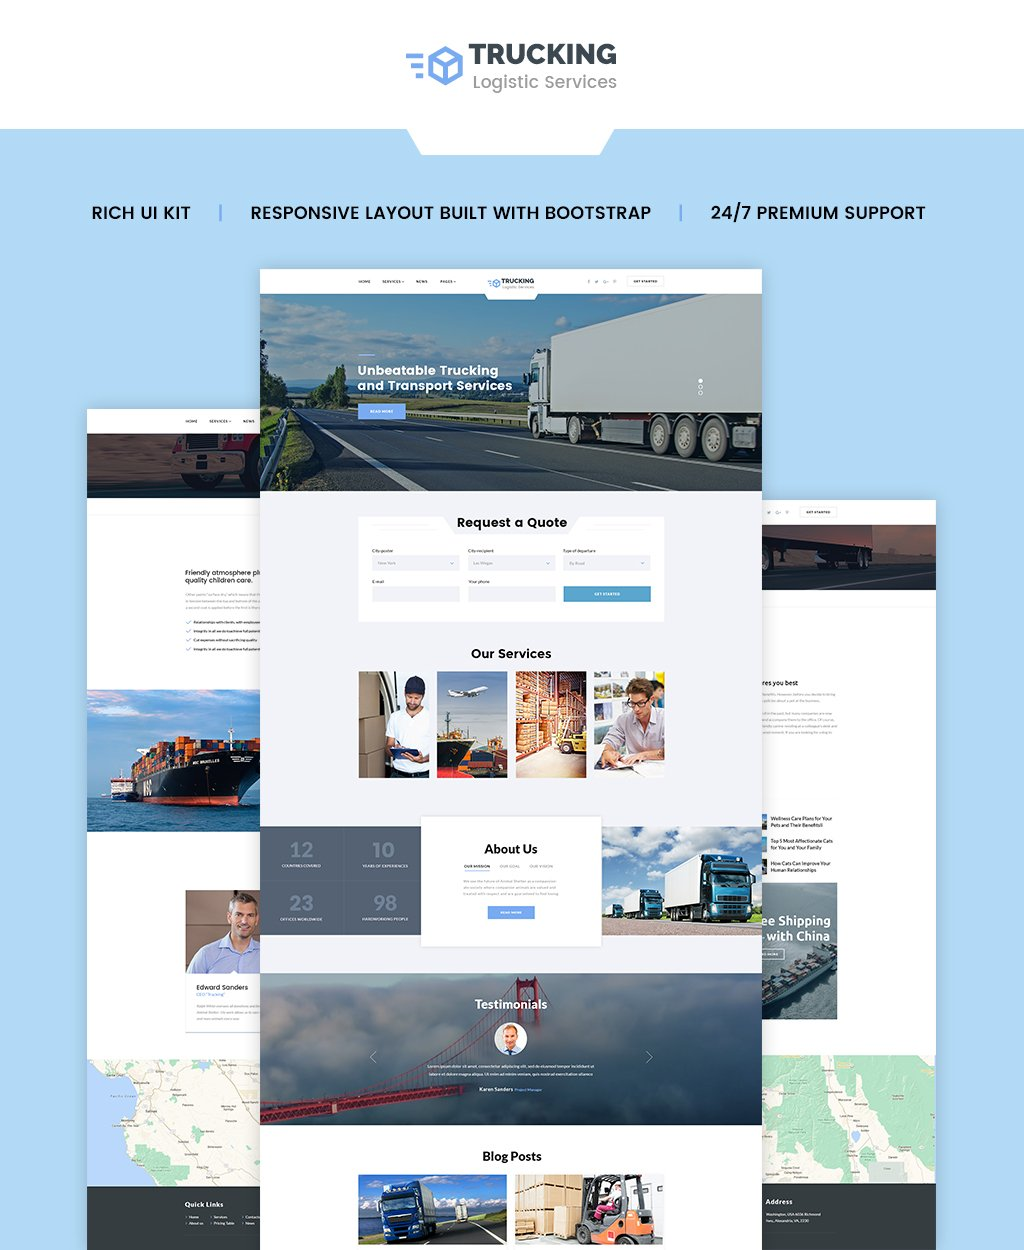 Trucking - Logistics & Transportation Services HTML №62264 - скриншот